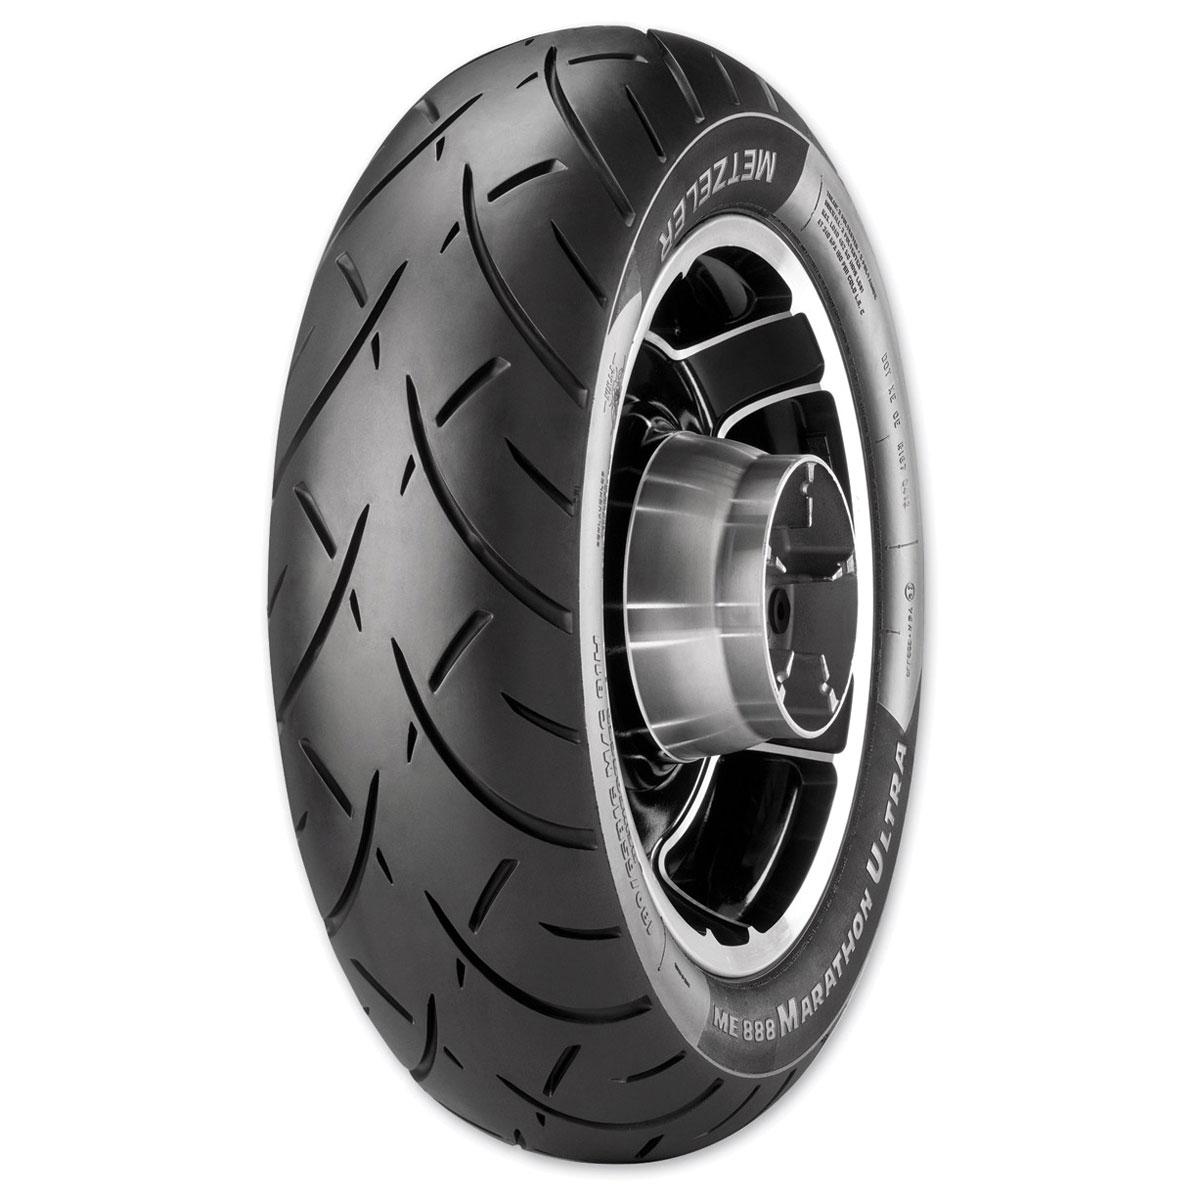 Metzeler ME888 Marathon Ultra 180/65B16 Rear Tire - 2318700